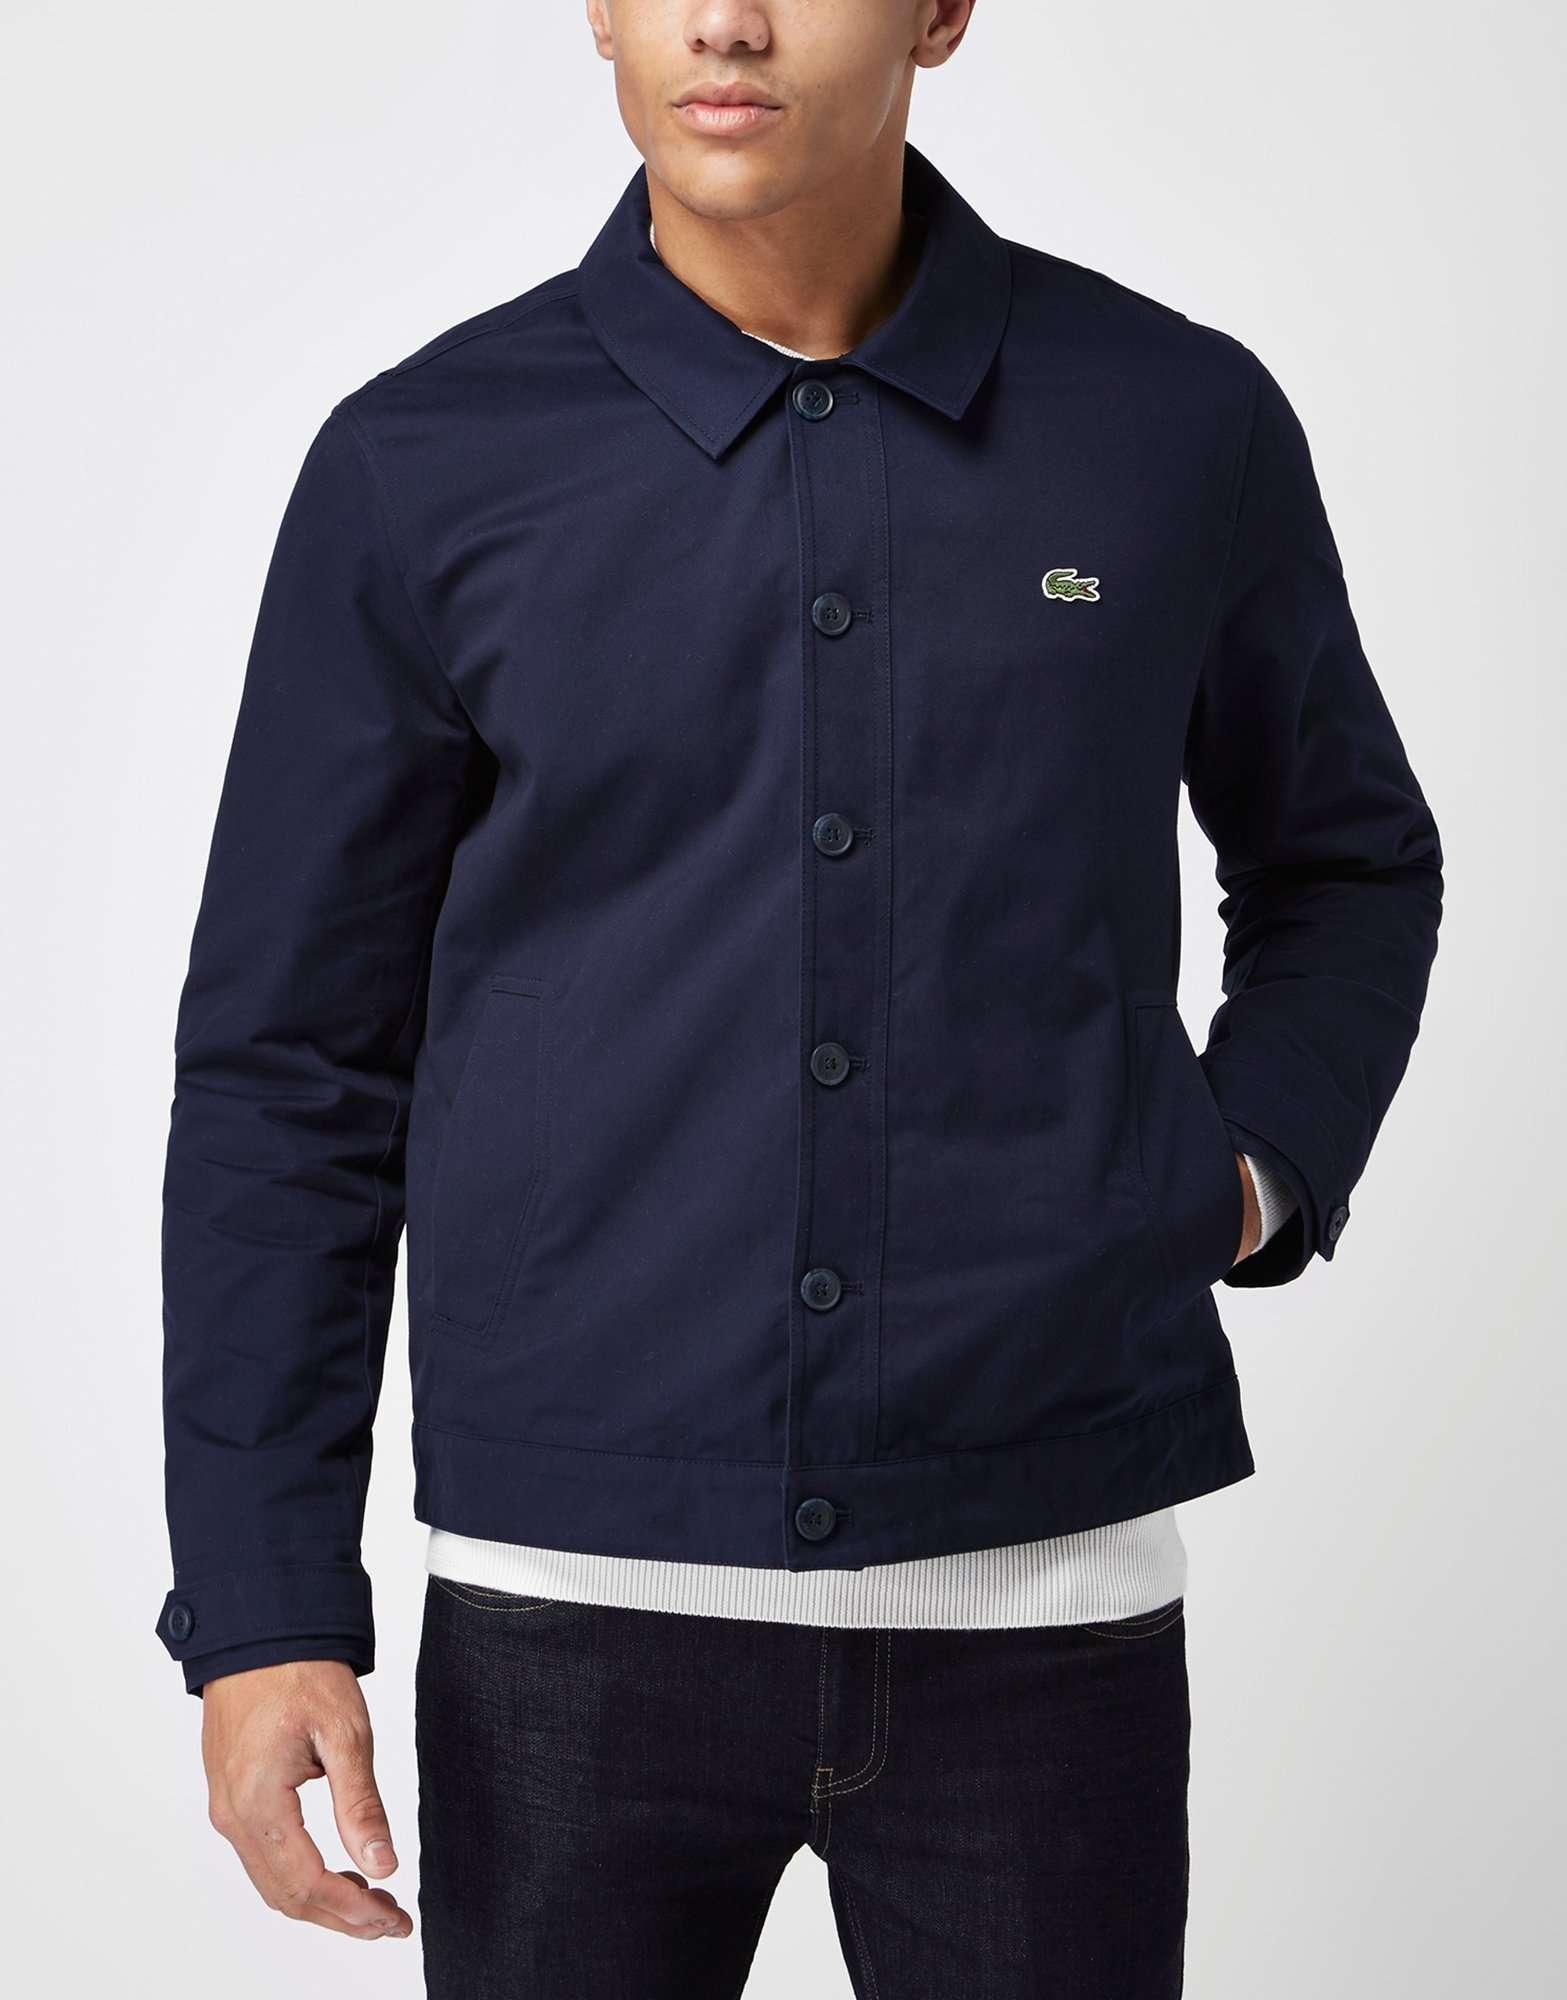 lacoste lightweight mac jacket scotts menswear. Black Bedroom Furniture Sets. Home Design Ideas